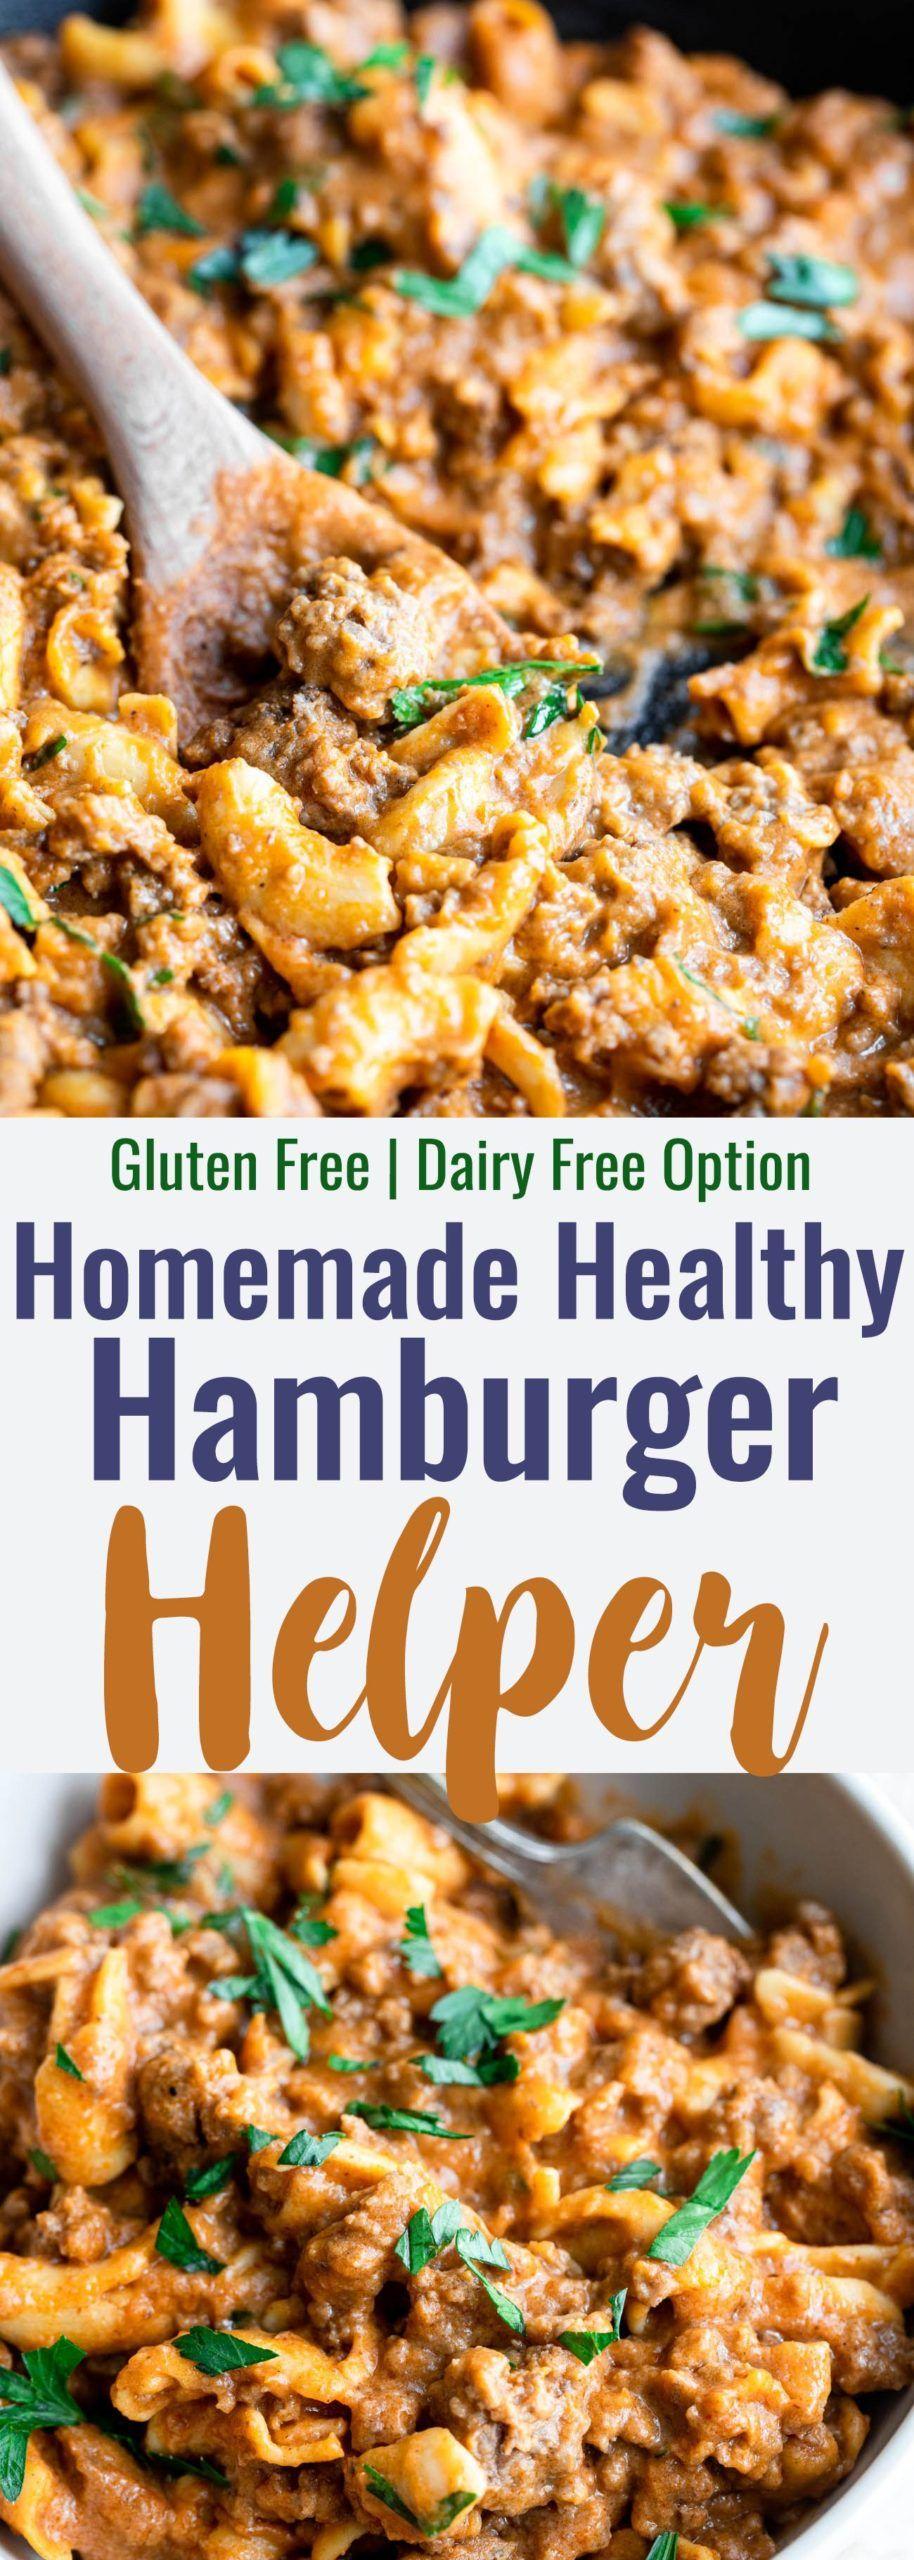 Selbst gemachter gesunder Hamburger-Helfer | Food Faith Fitness, #Faith #Fitness #Food #gemachter #g...